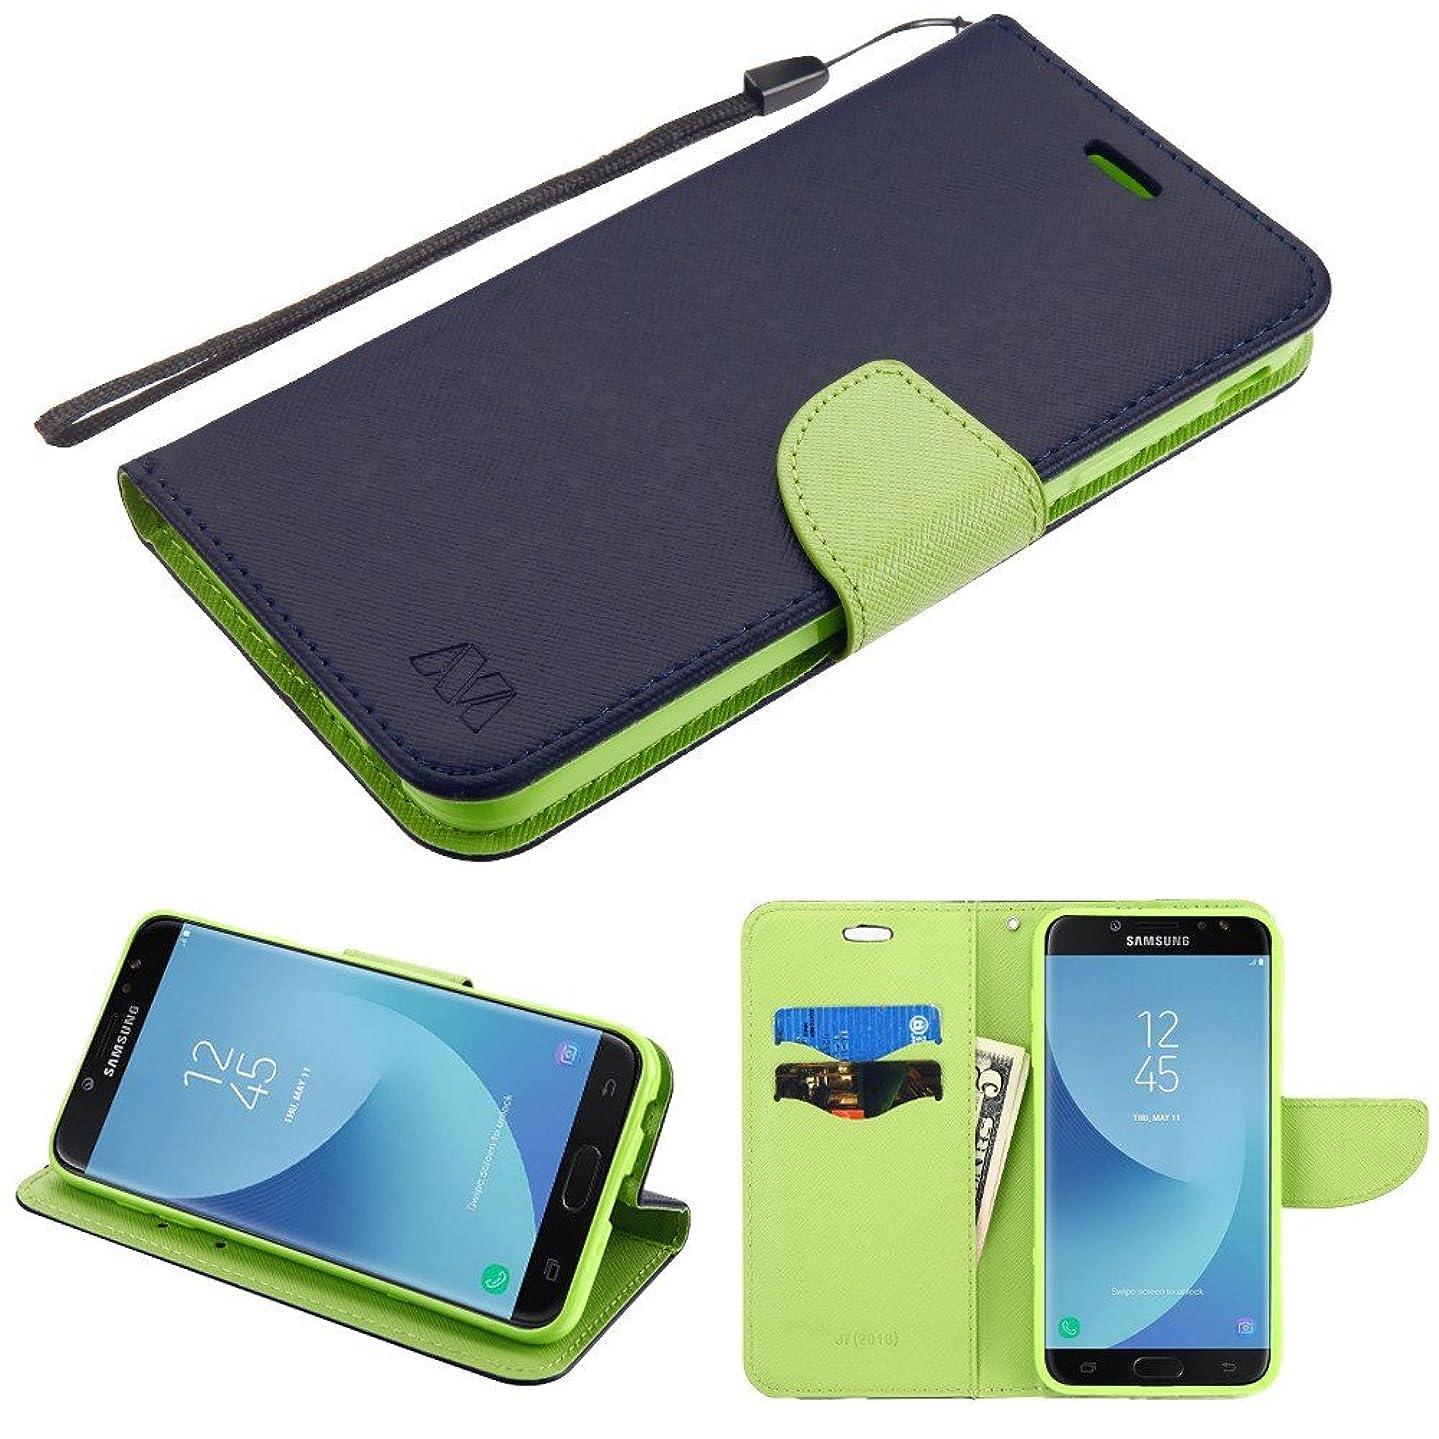 HD Accessory Diary Leather Wallet Case for Samsung Galaxy J7 (2018) / J7 Refine / J7 Star / J7 V (2nd Gen) - Navy Blue Green